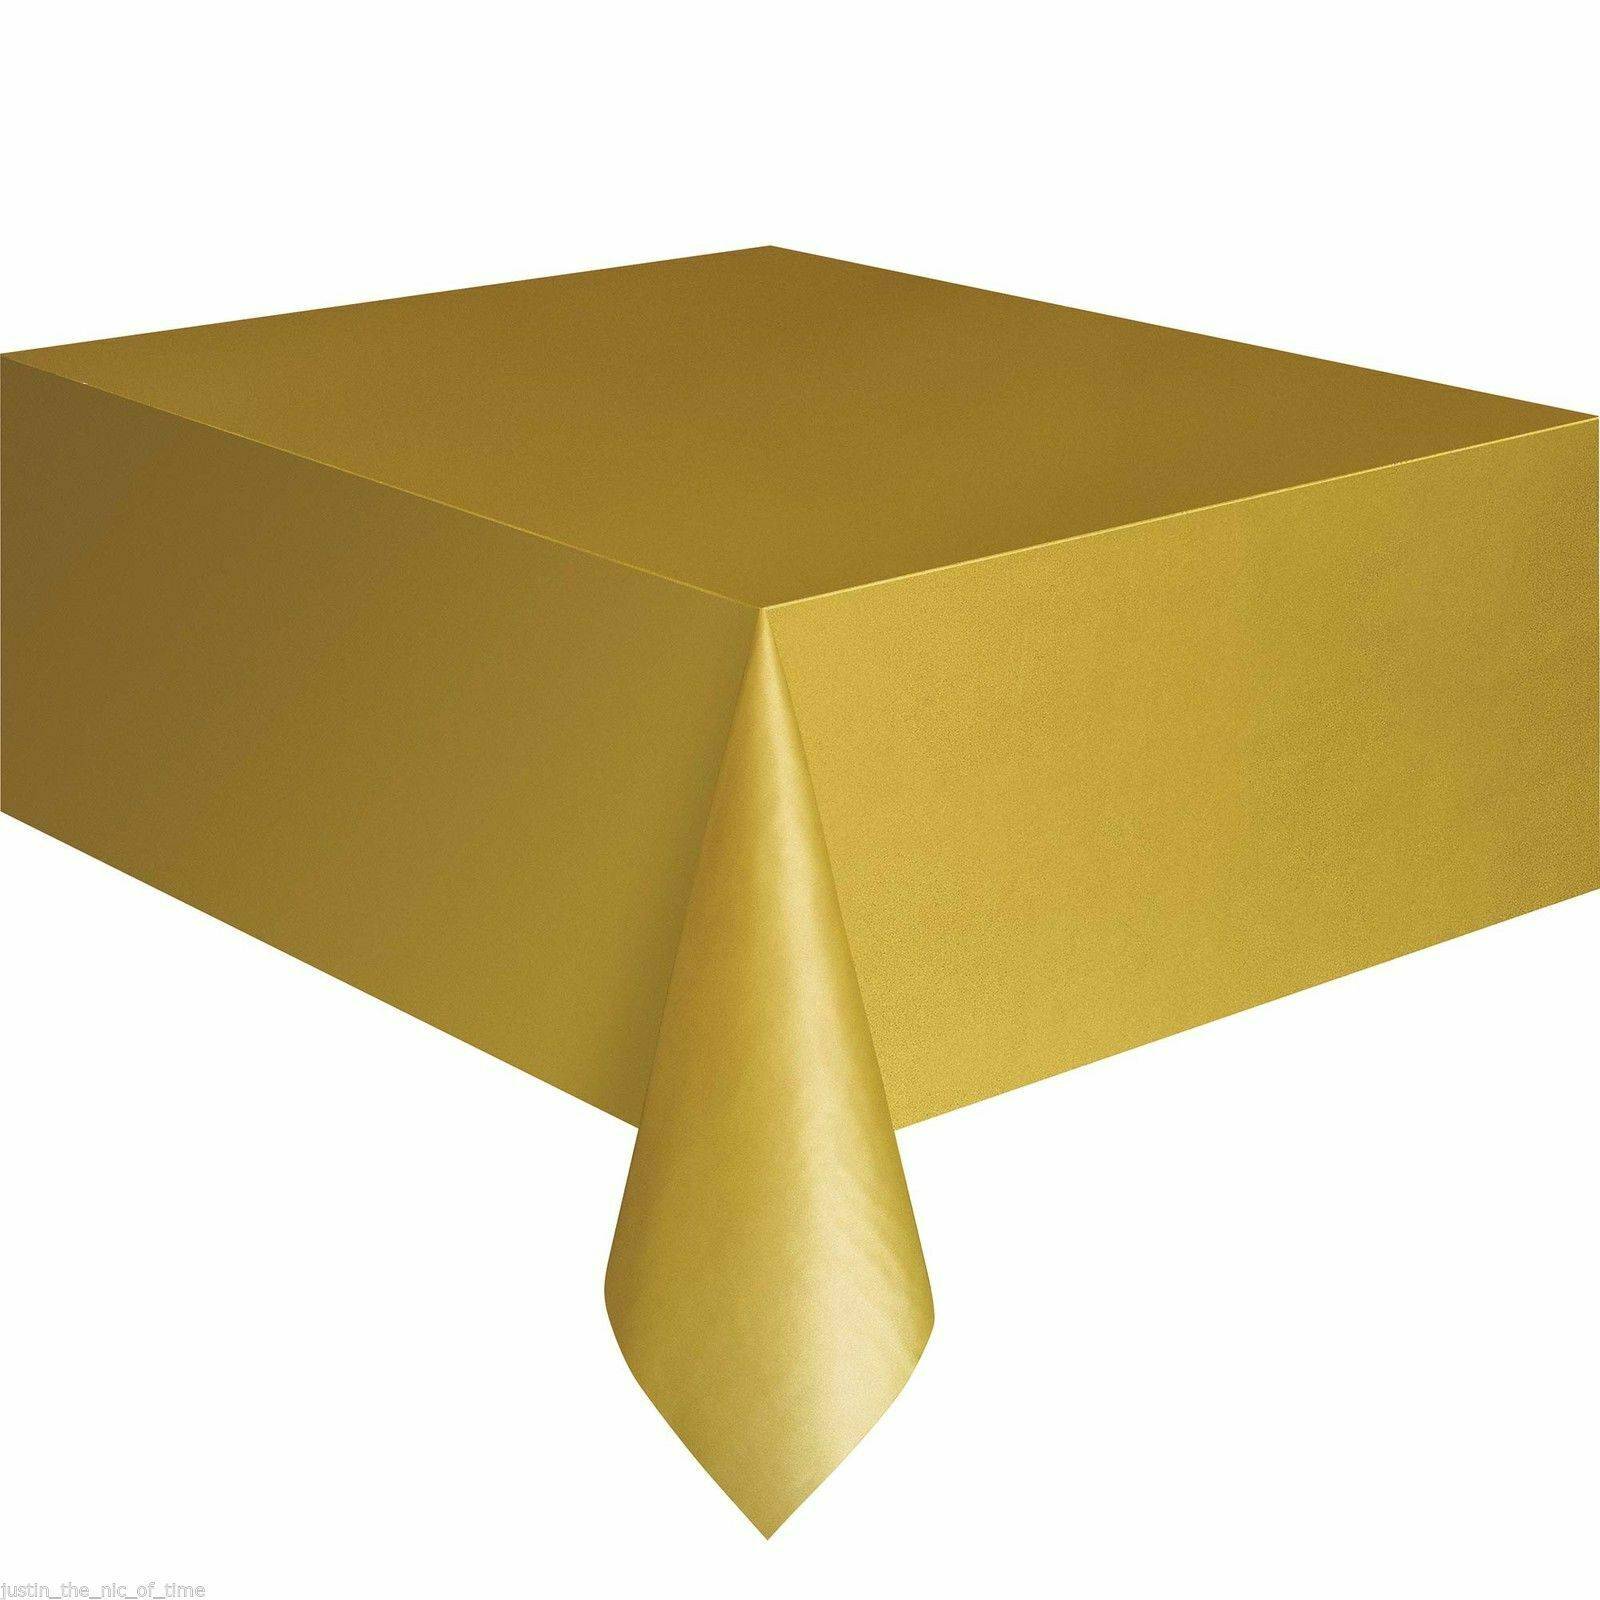 1 ud. Mantel desechable de plástico de 137*183 cm, mantel de mesa para bodas, cumpleaños, mantel rectangular, paño de mesa, toallitas, cubiertas, venta